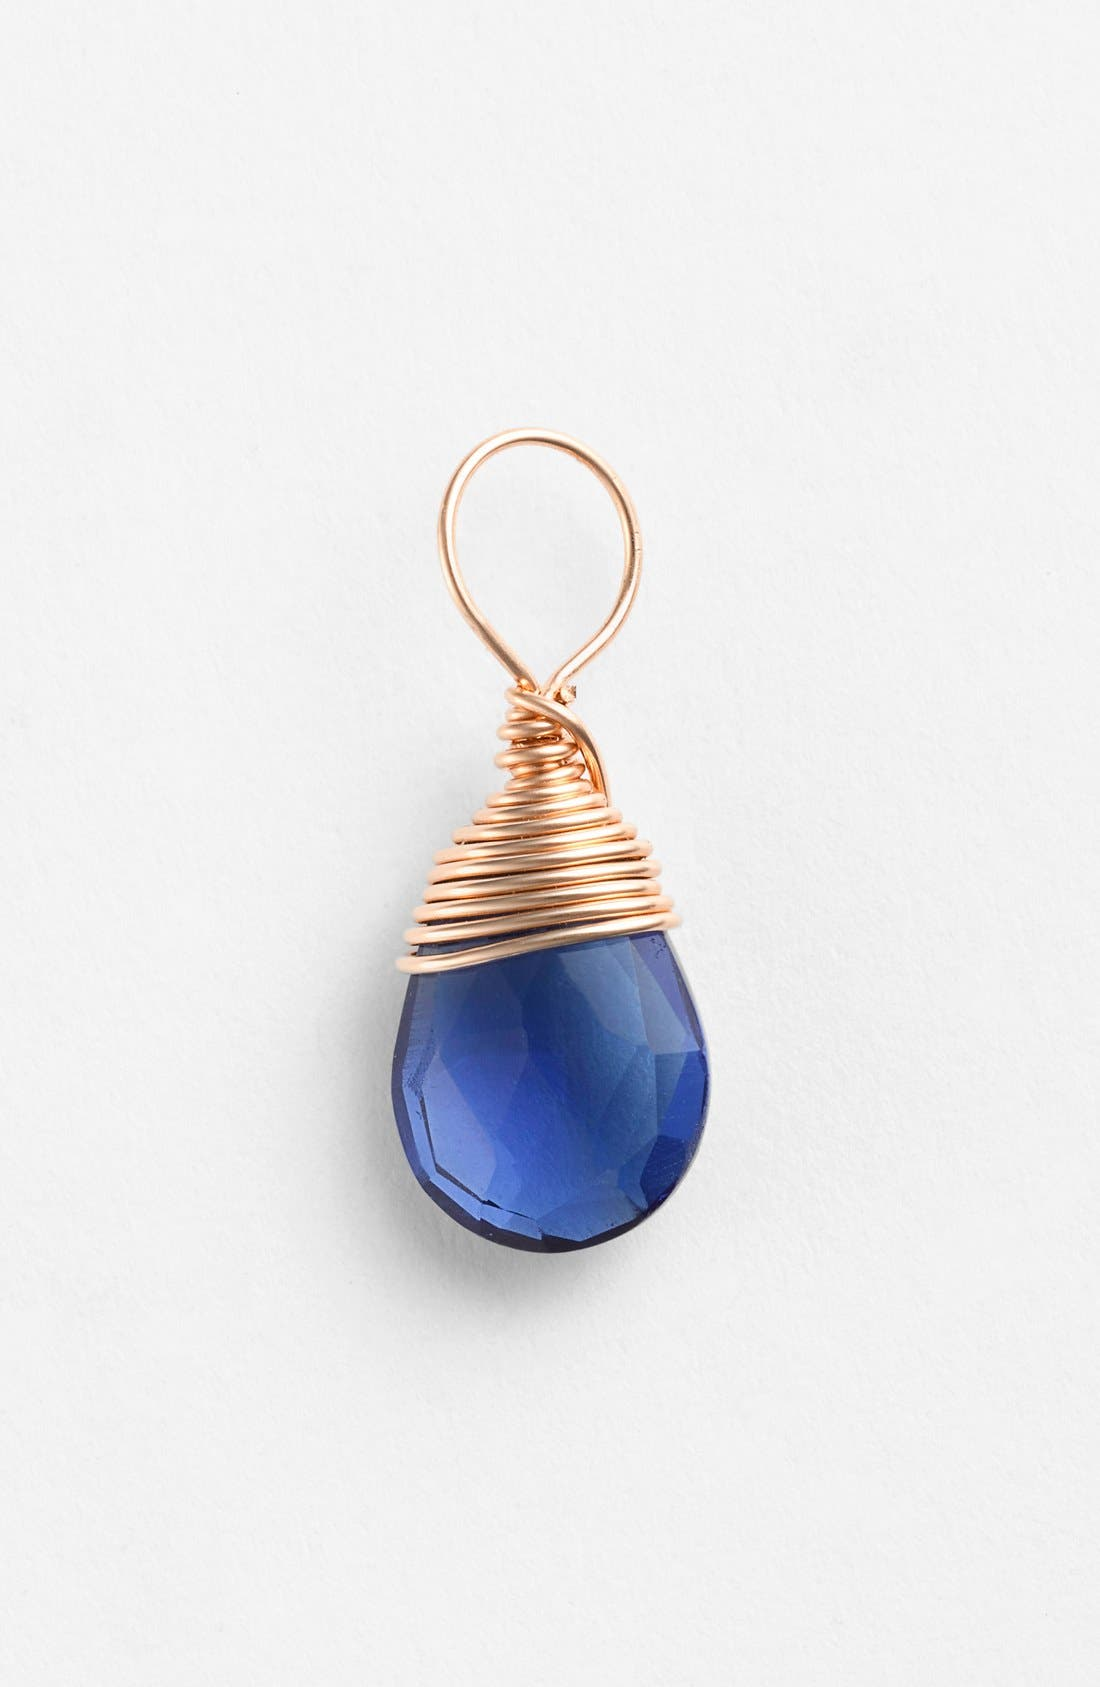 Main Image - Nashelle 14k-Rose Gold Fill & Semiprecious Stone Charm